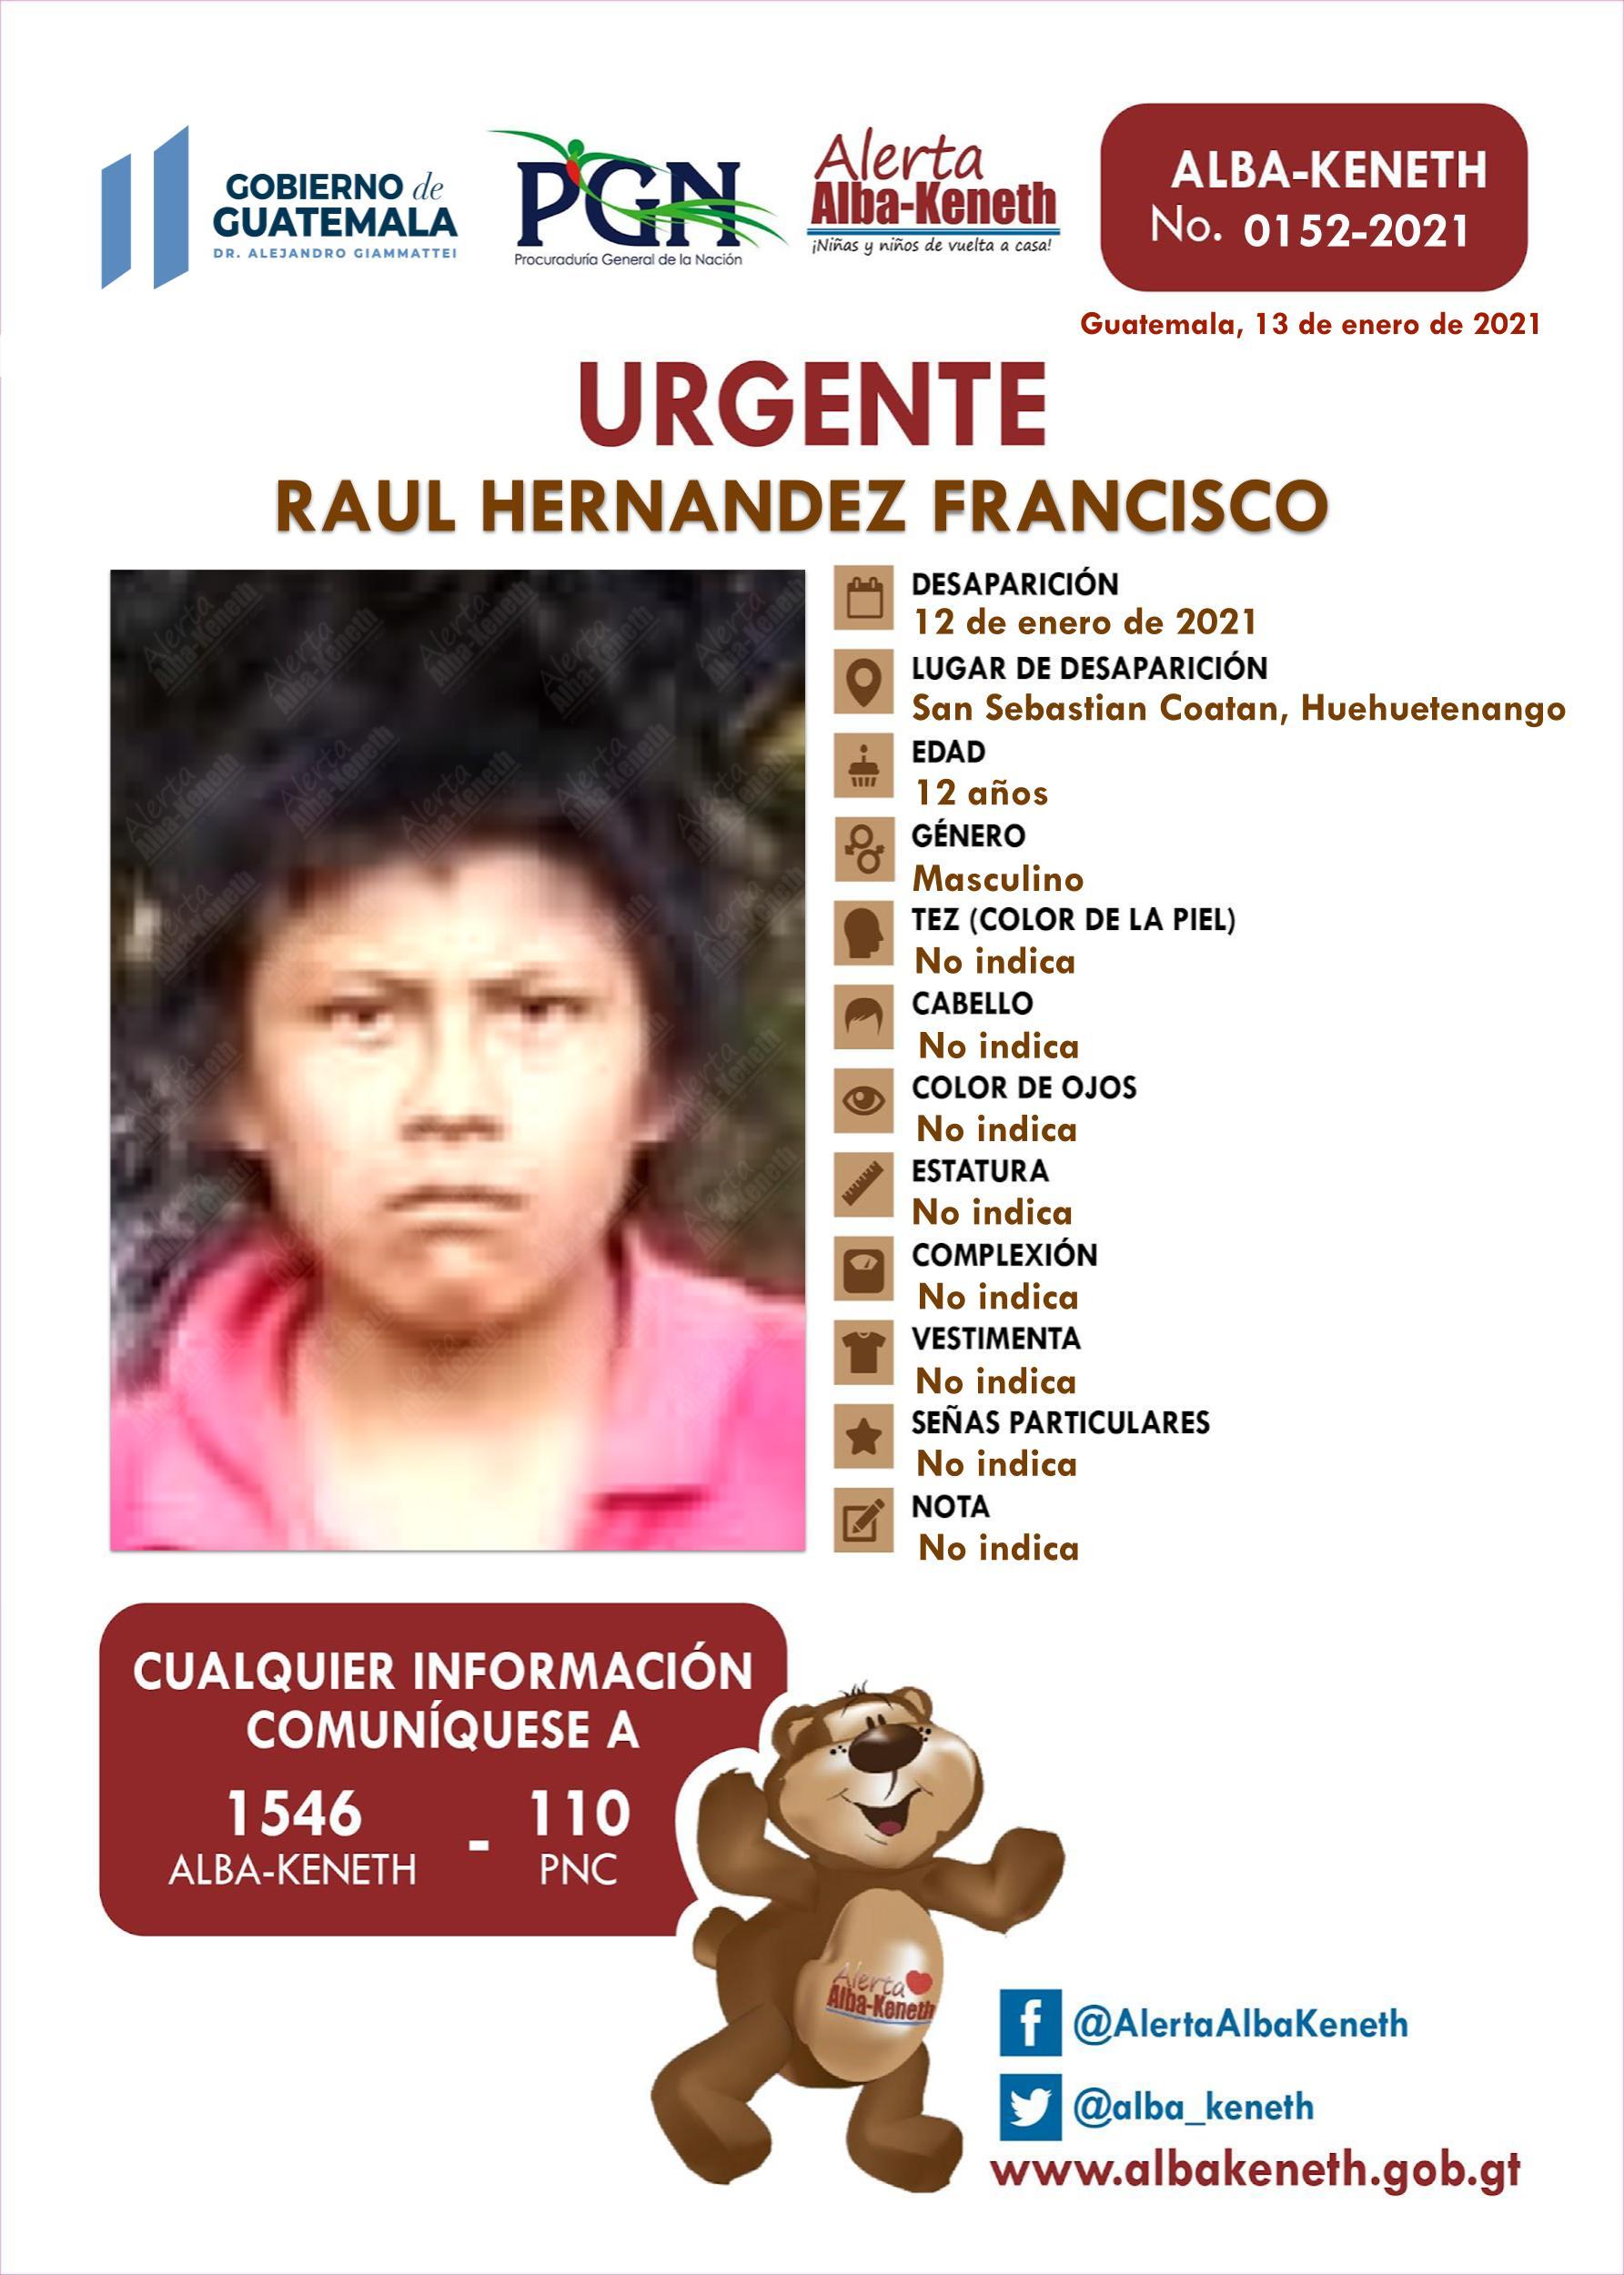 Raul Hernandez Francisco